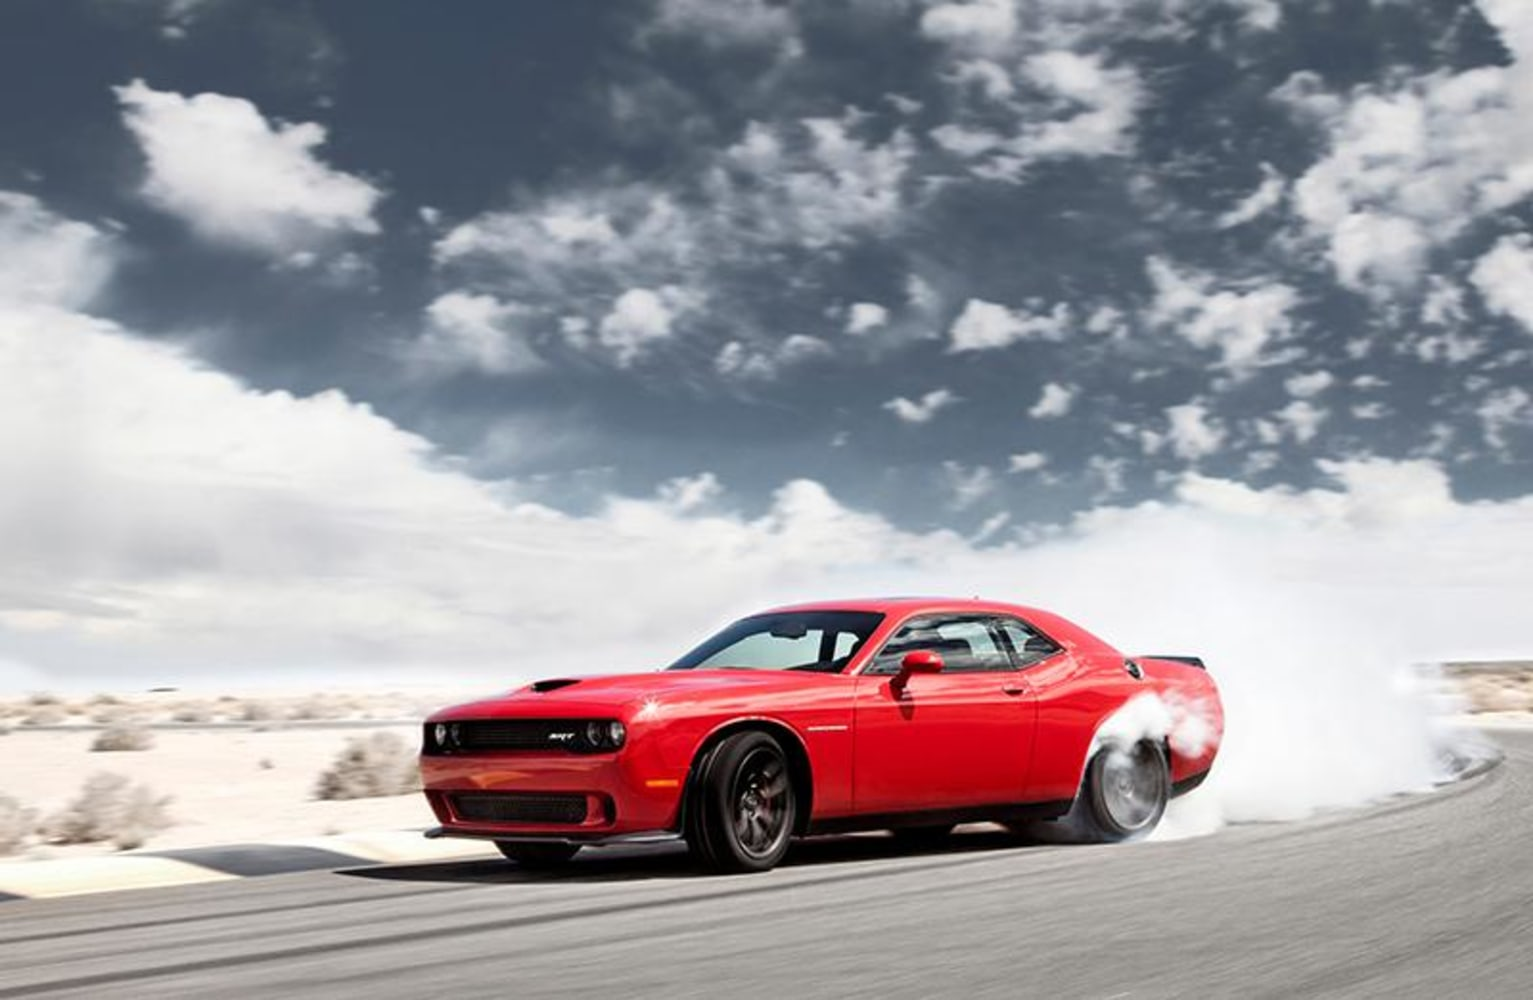 image chrysler group llc 2015 dodge challenger srt - 2015 Dodge Challenger Srt With The Hemi Hellcat Engine